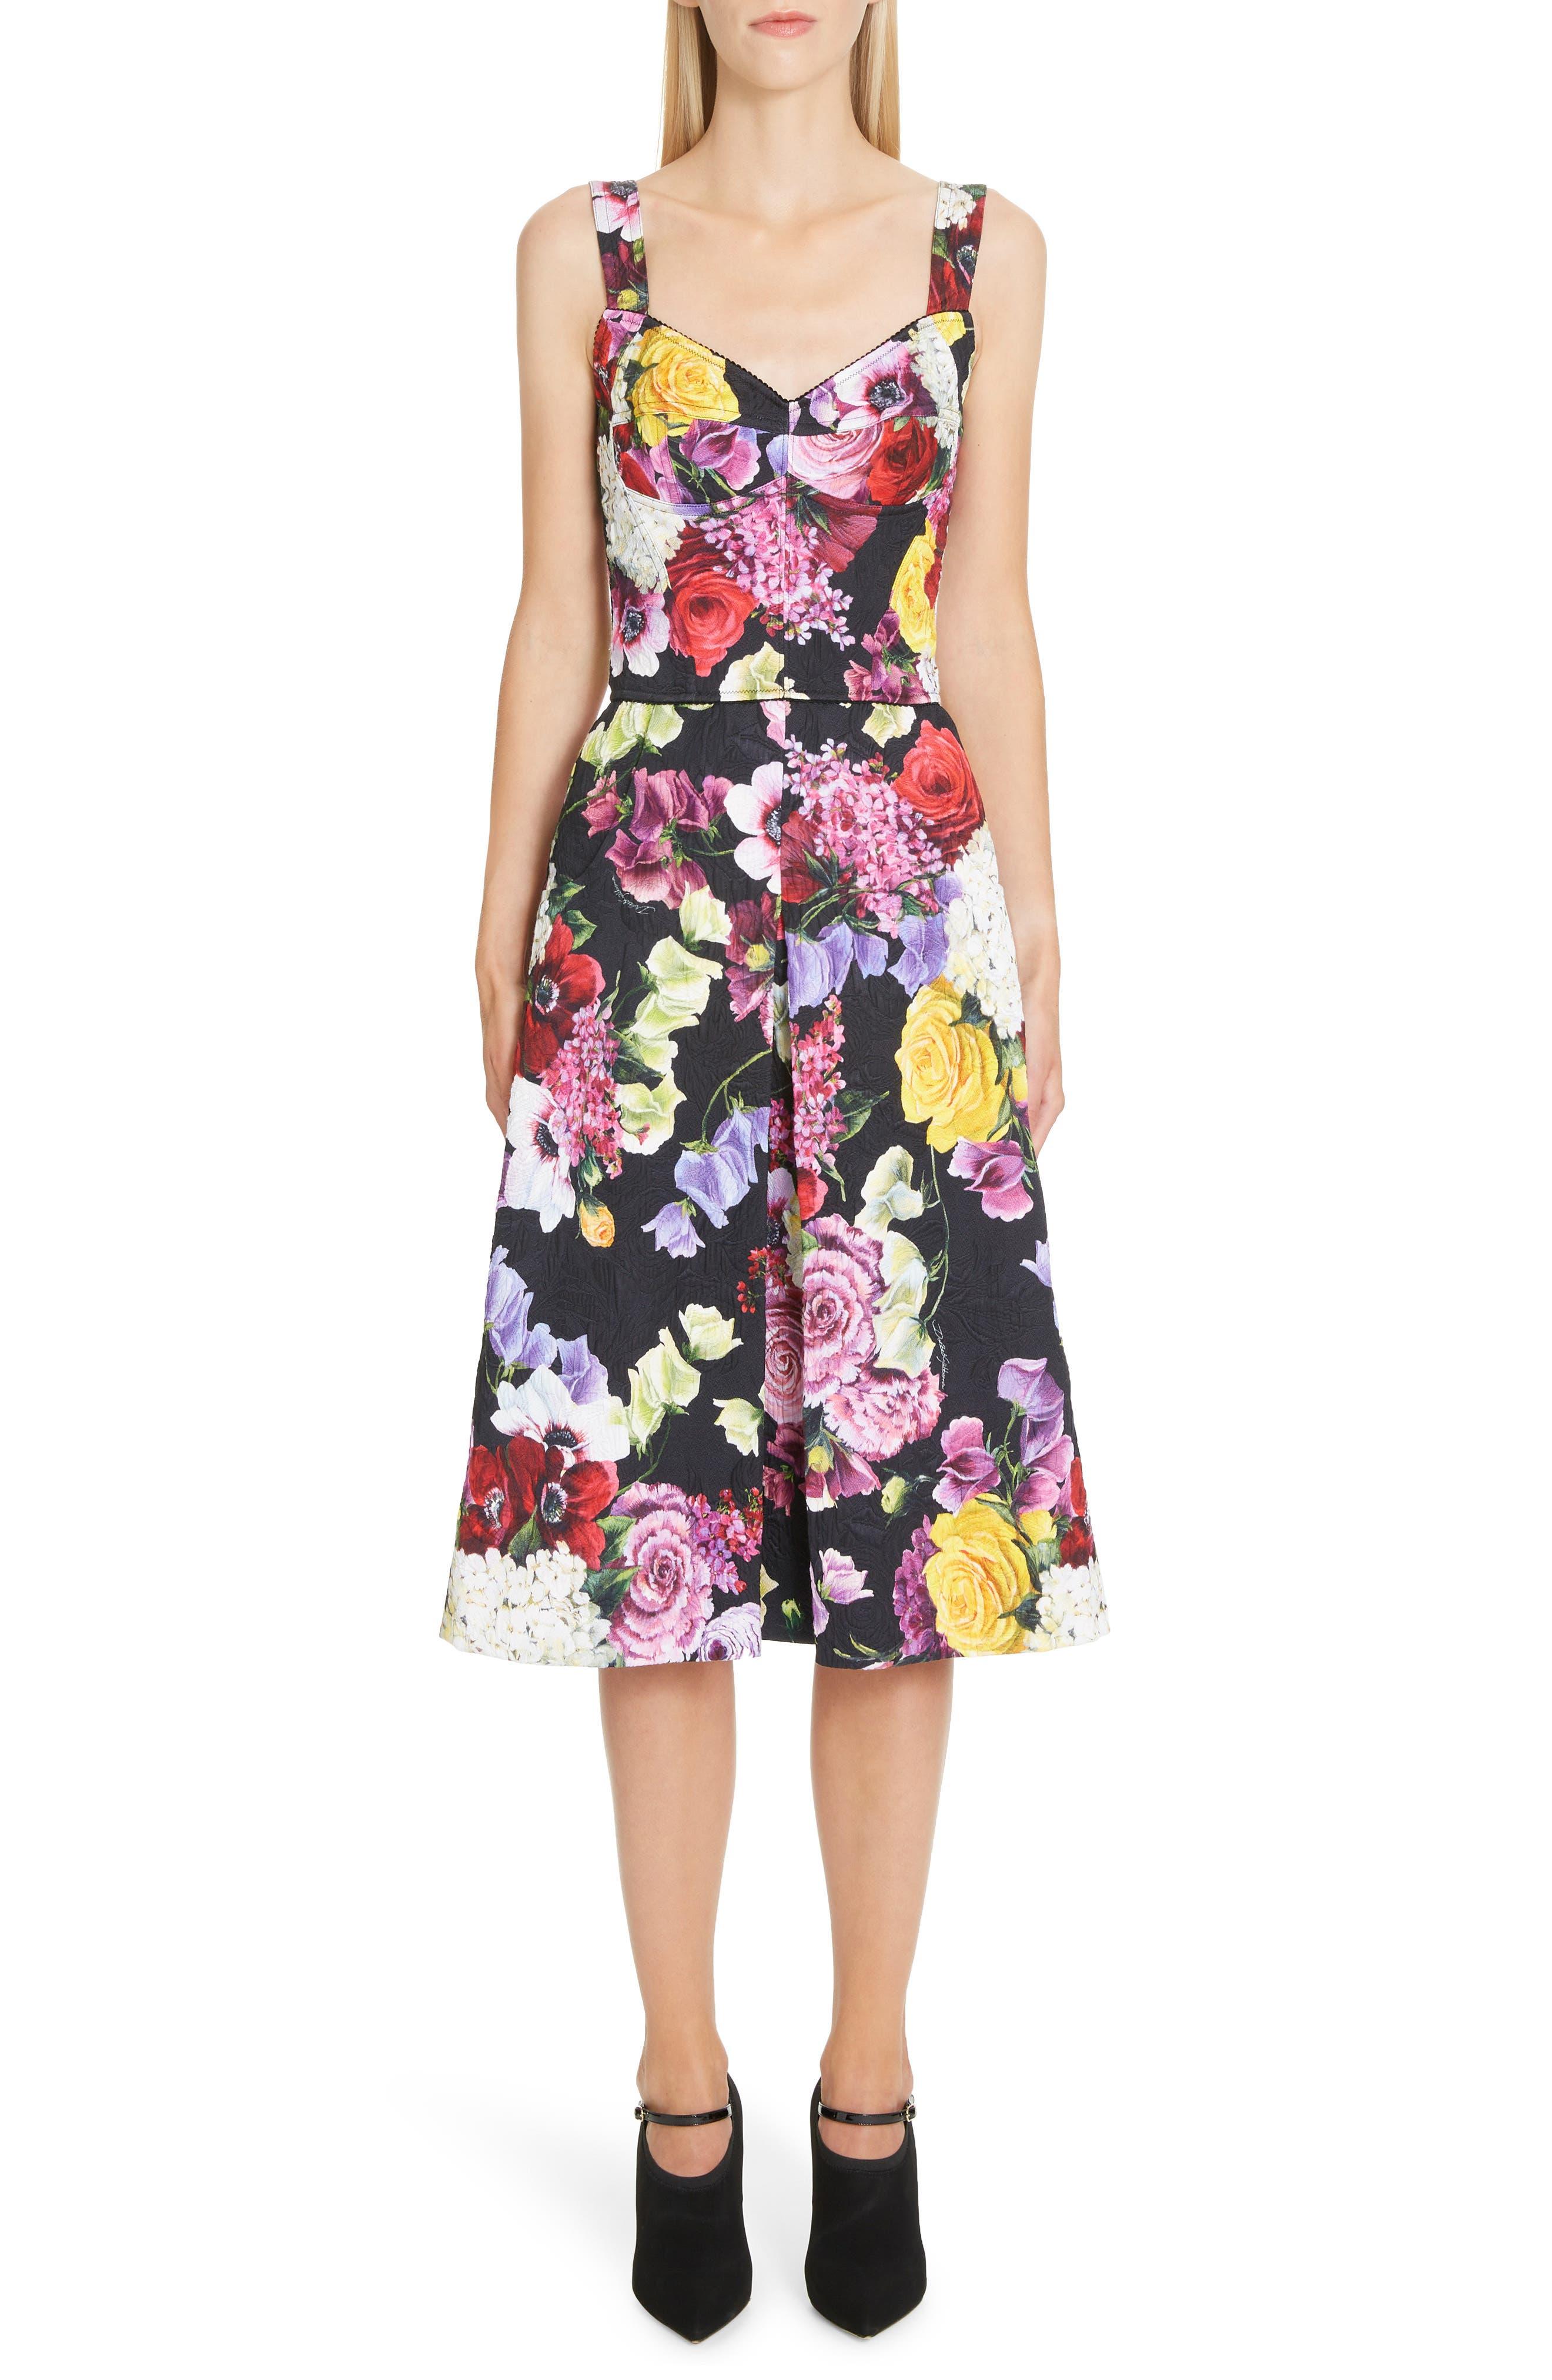 Dolce & gabbana Floral Print Brocade Bustier Dress, 6 IT - Black